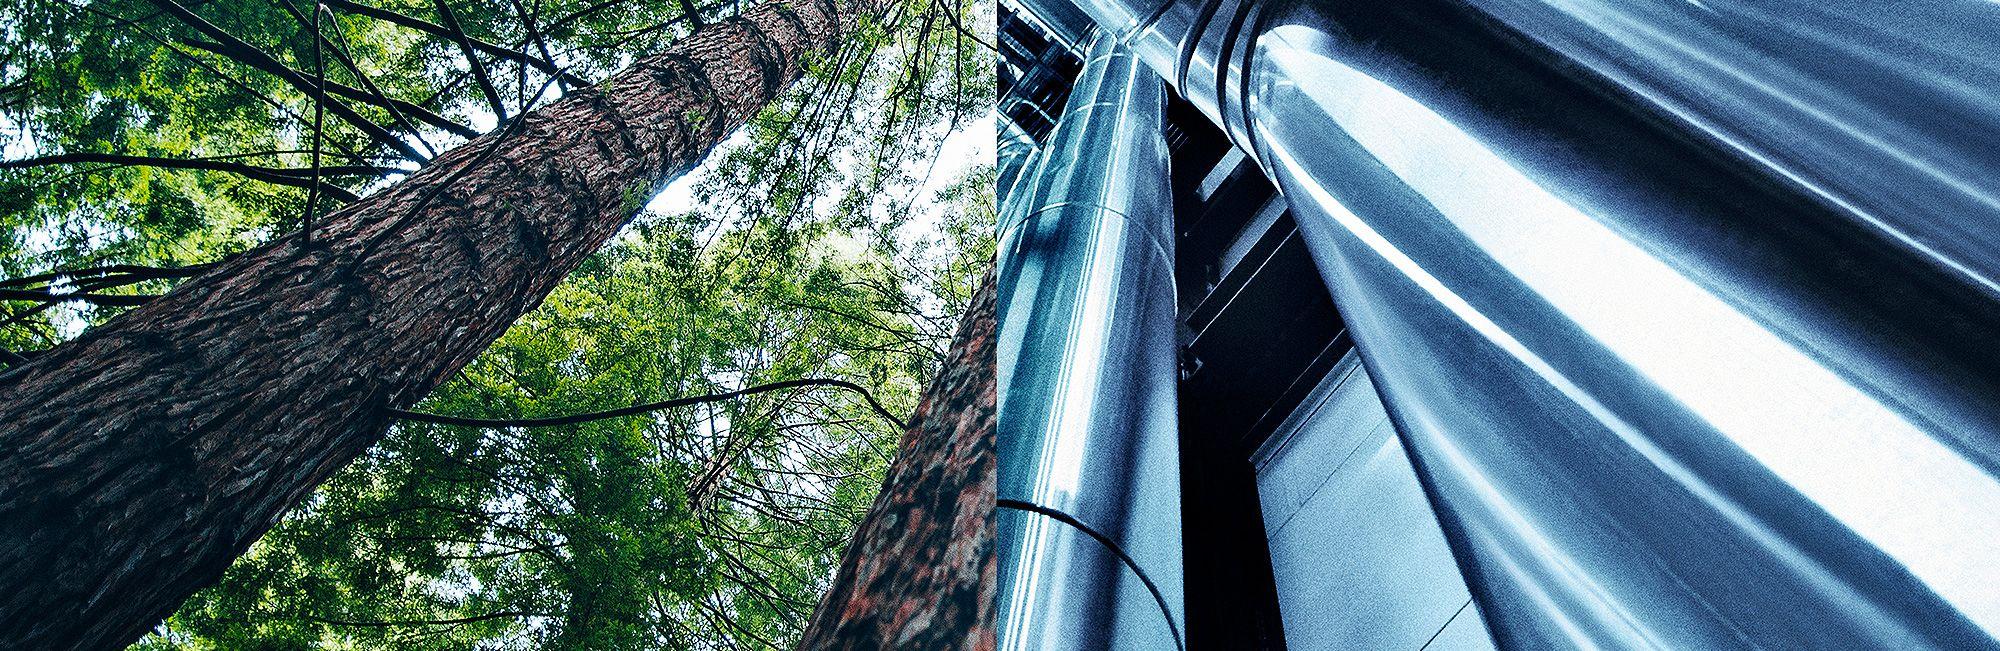 Pictures_2000x650_renewable3